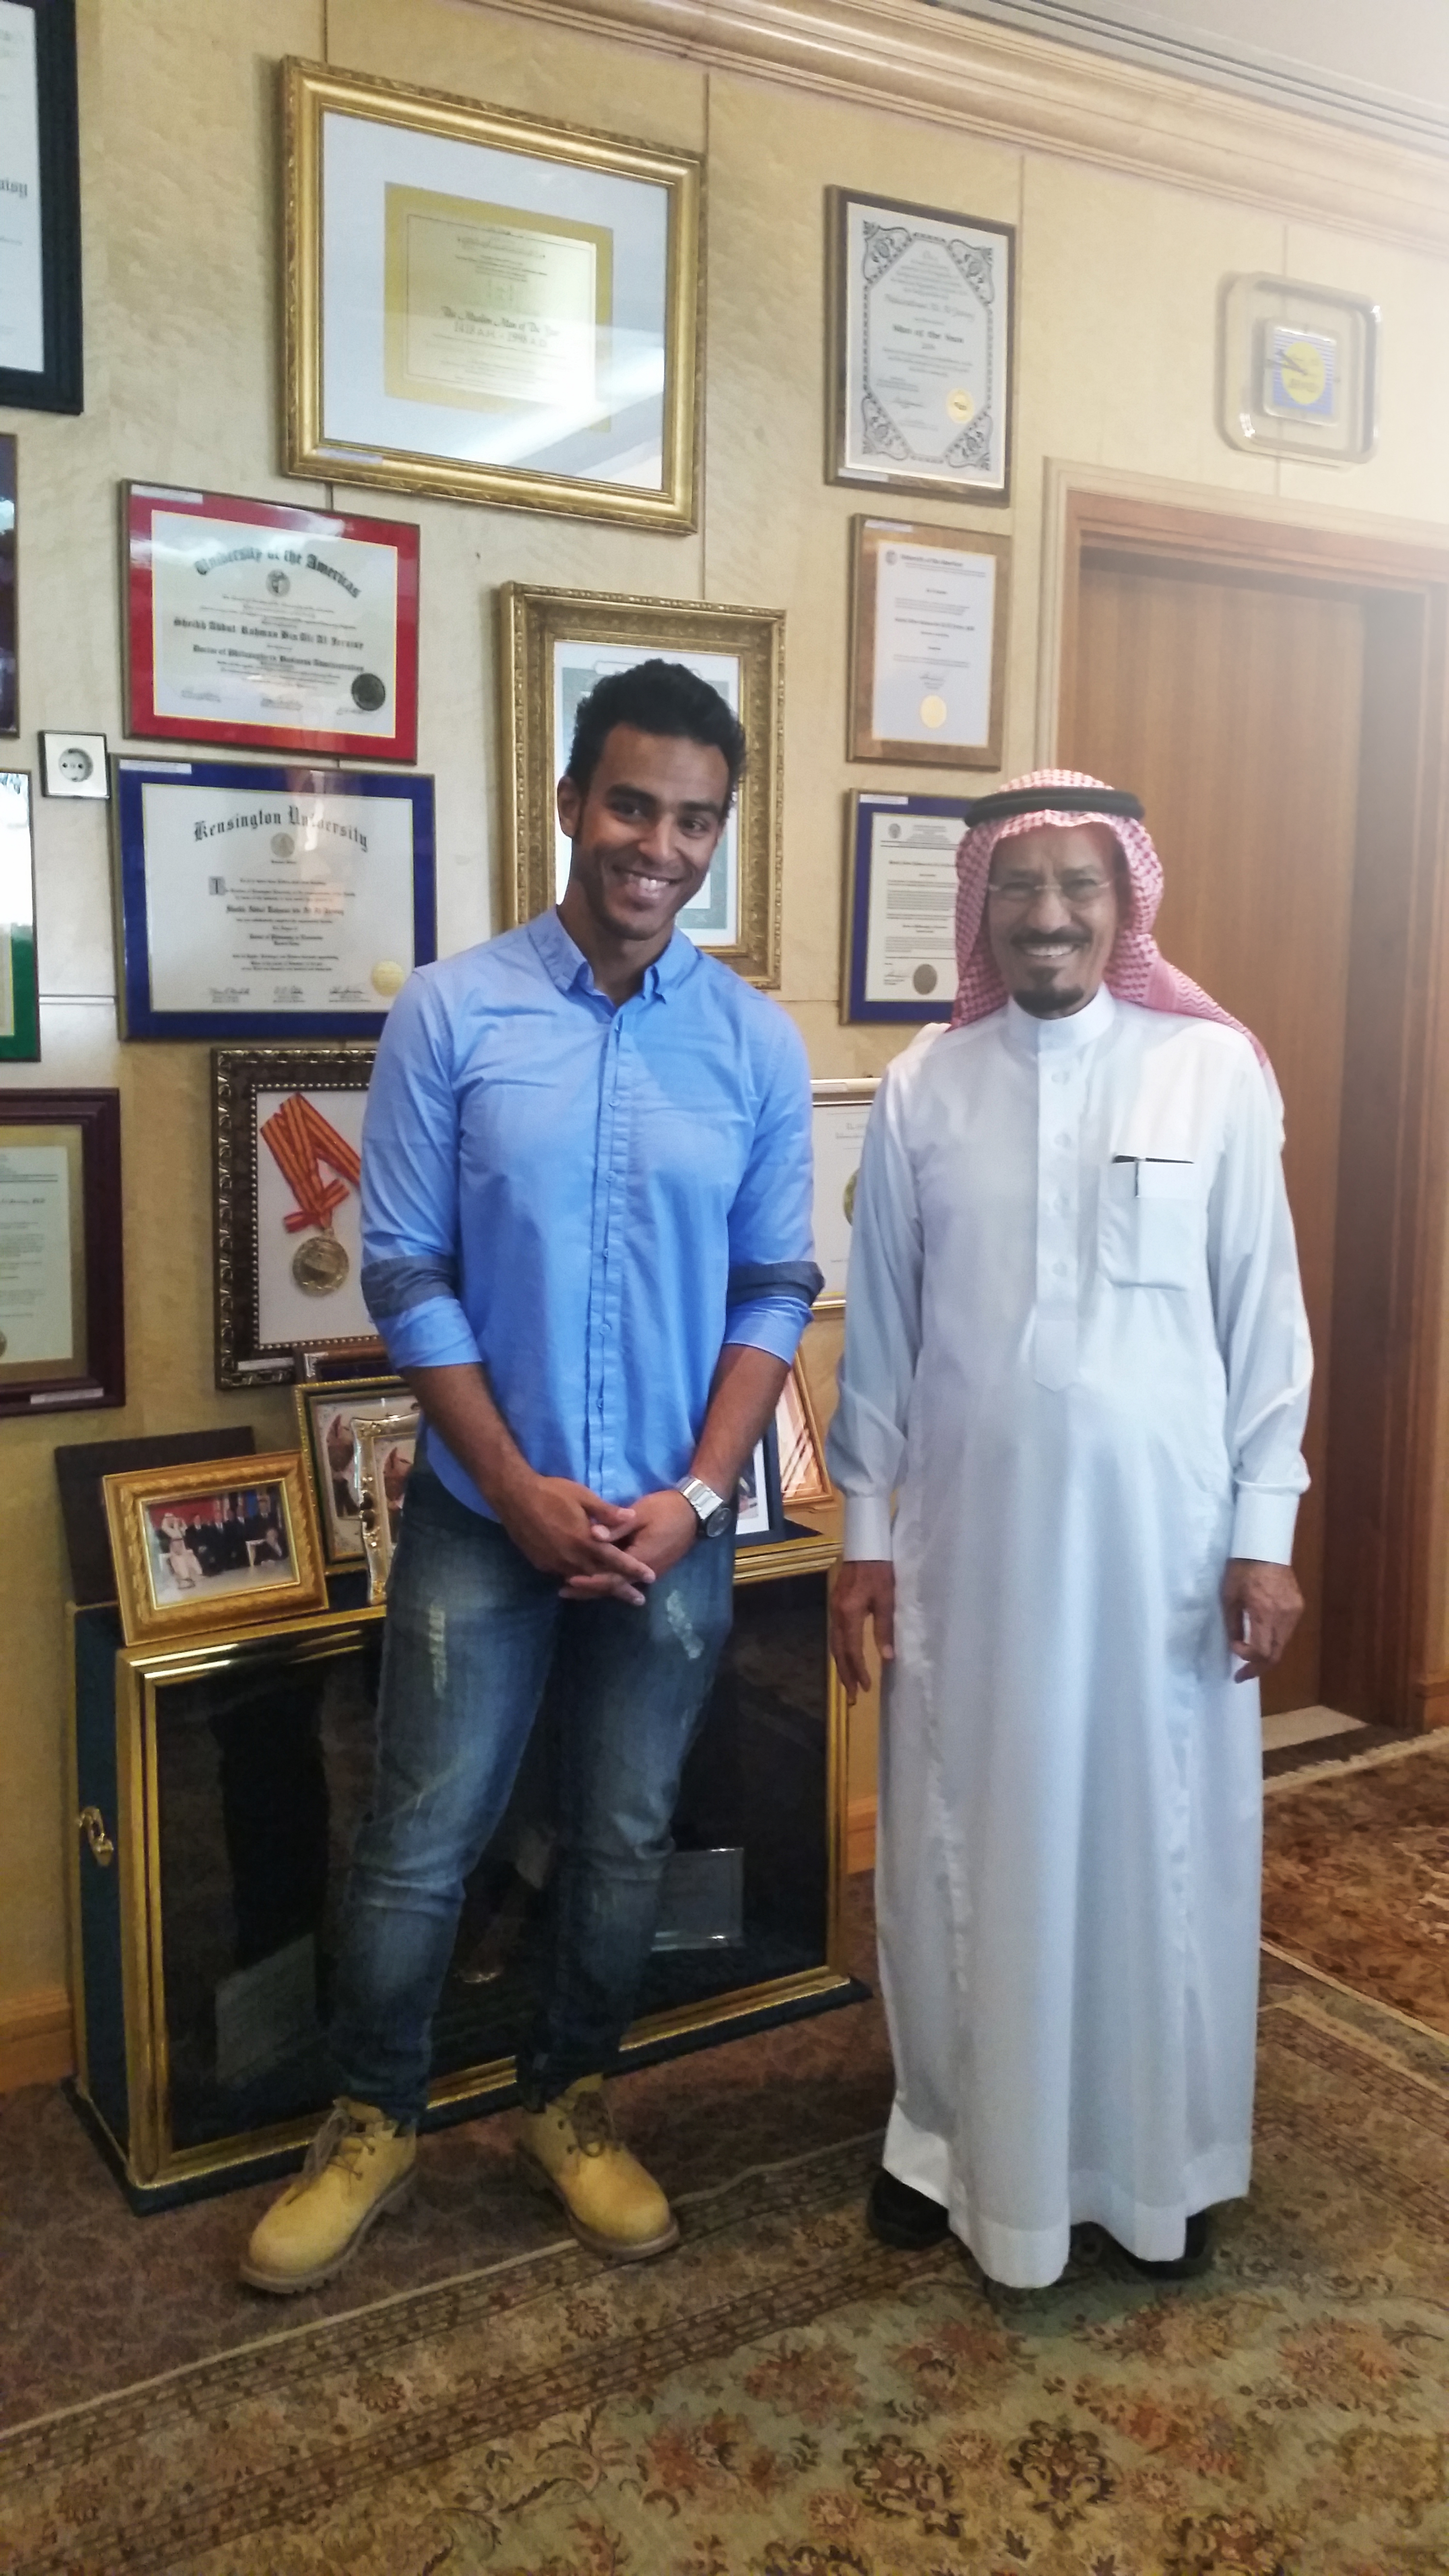 Mr. Abdulrahman Aljraisi